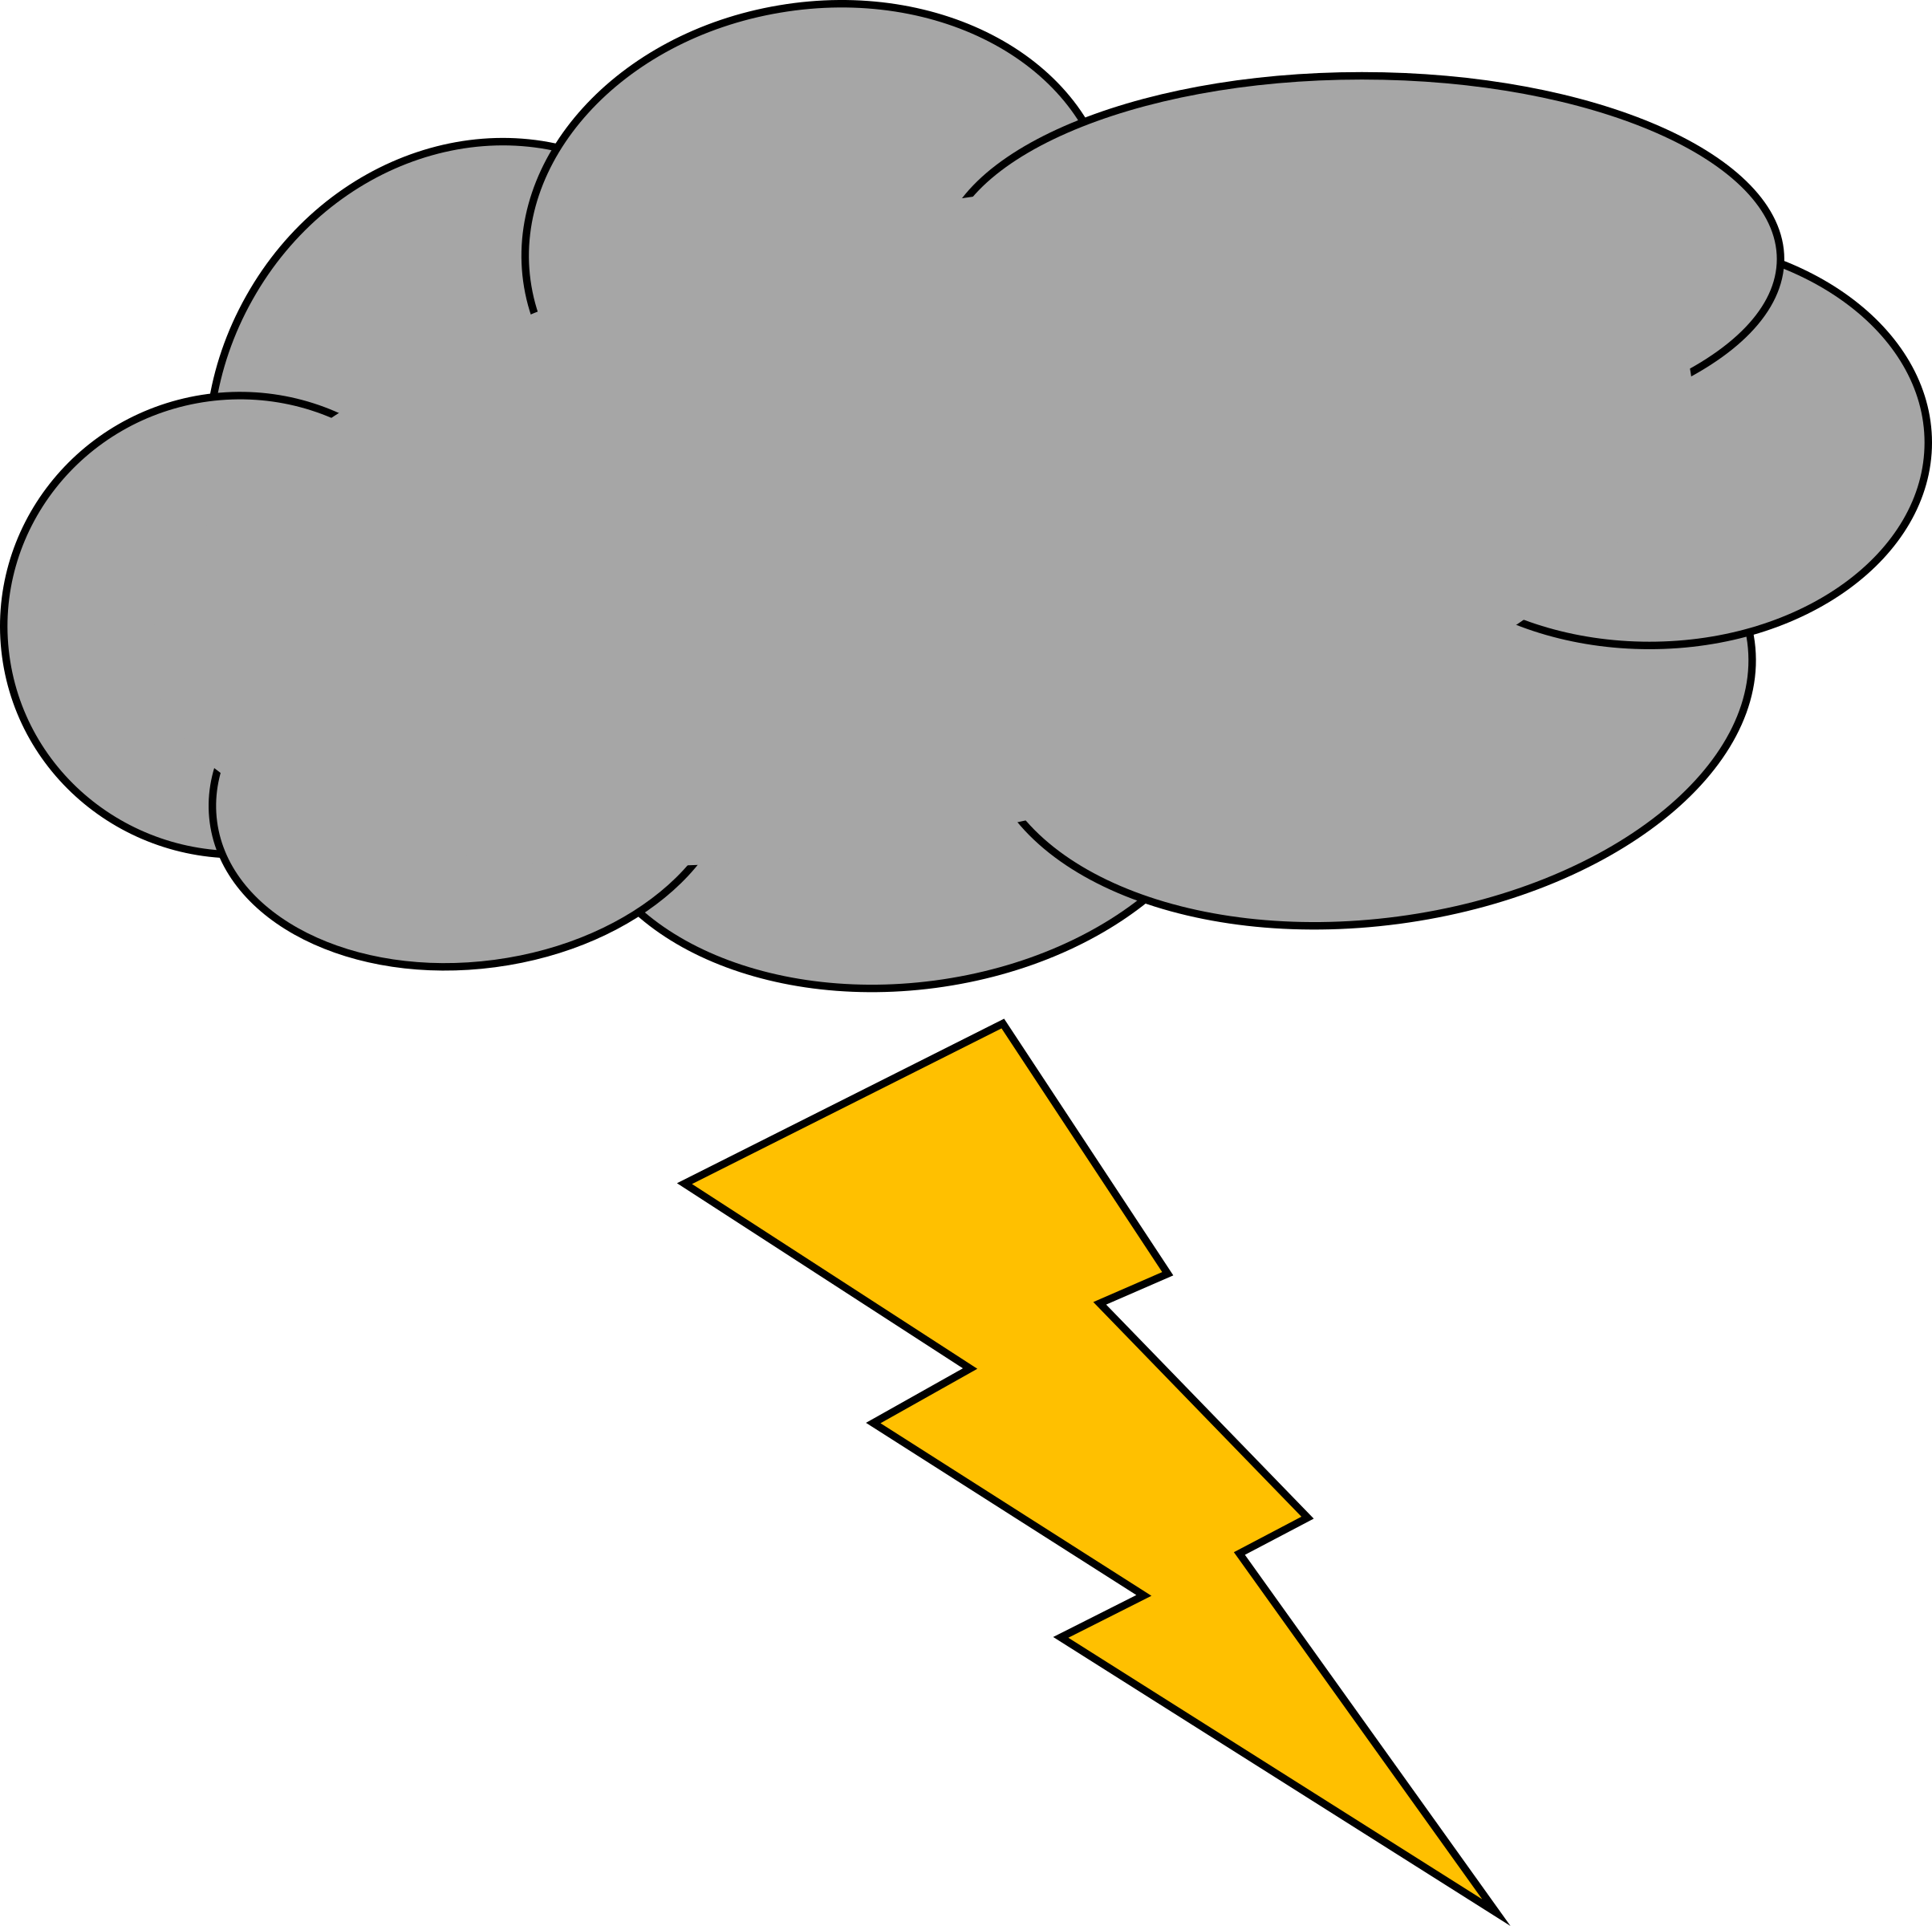 Thunder and lightning clipart